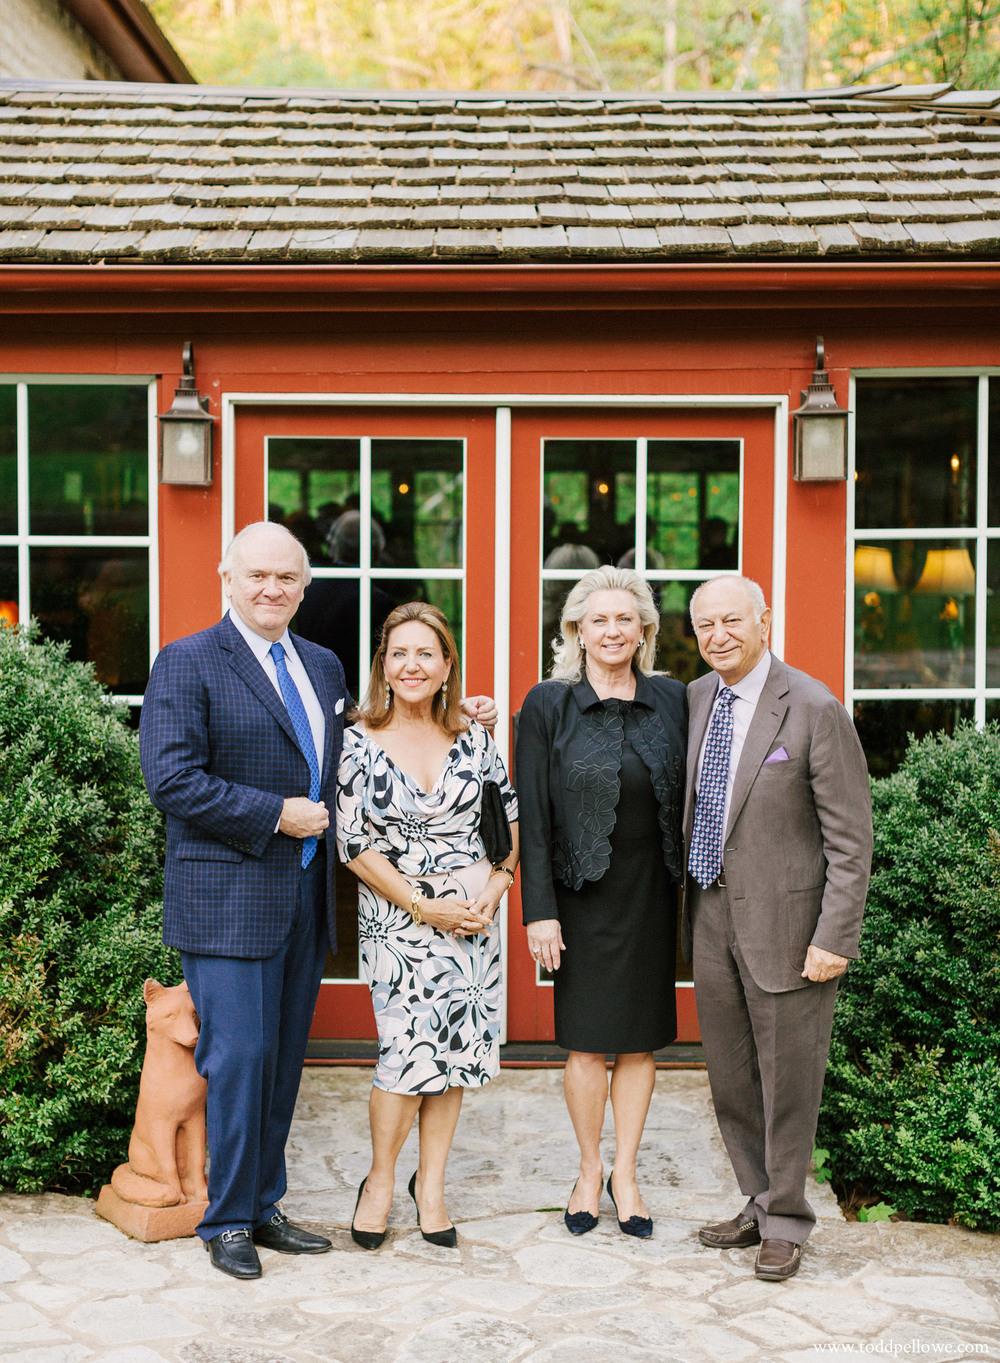 Lexington Cancer Foundation President, Brenda Rice